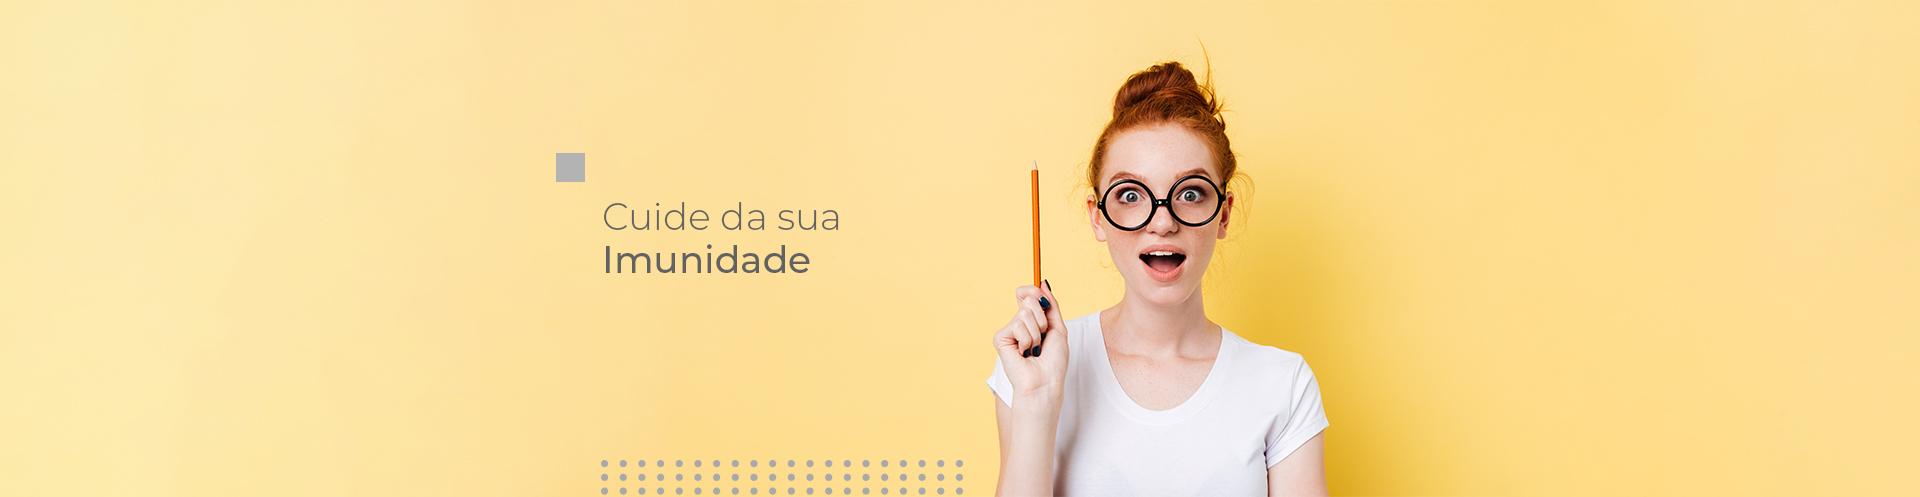 banner_site_imunidade